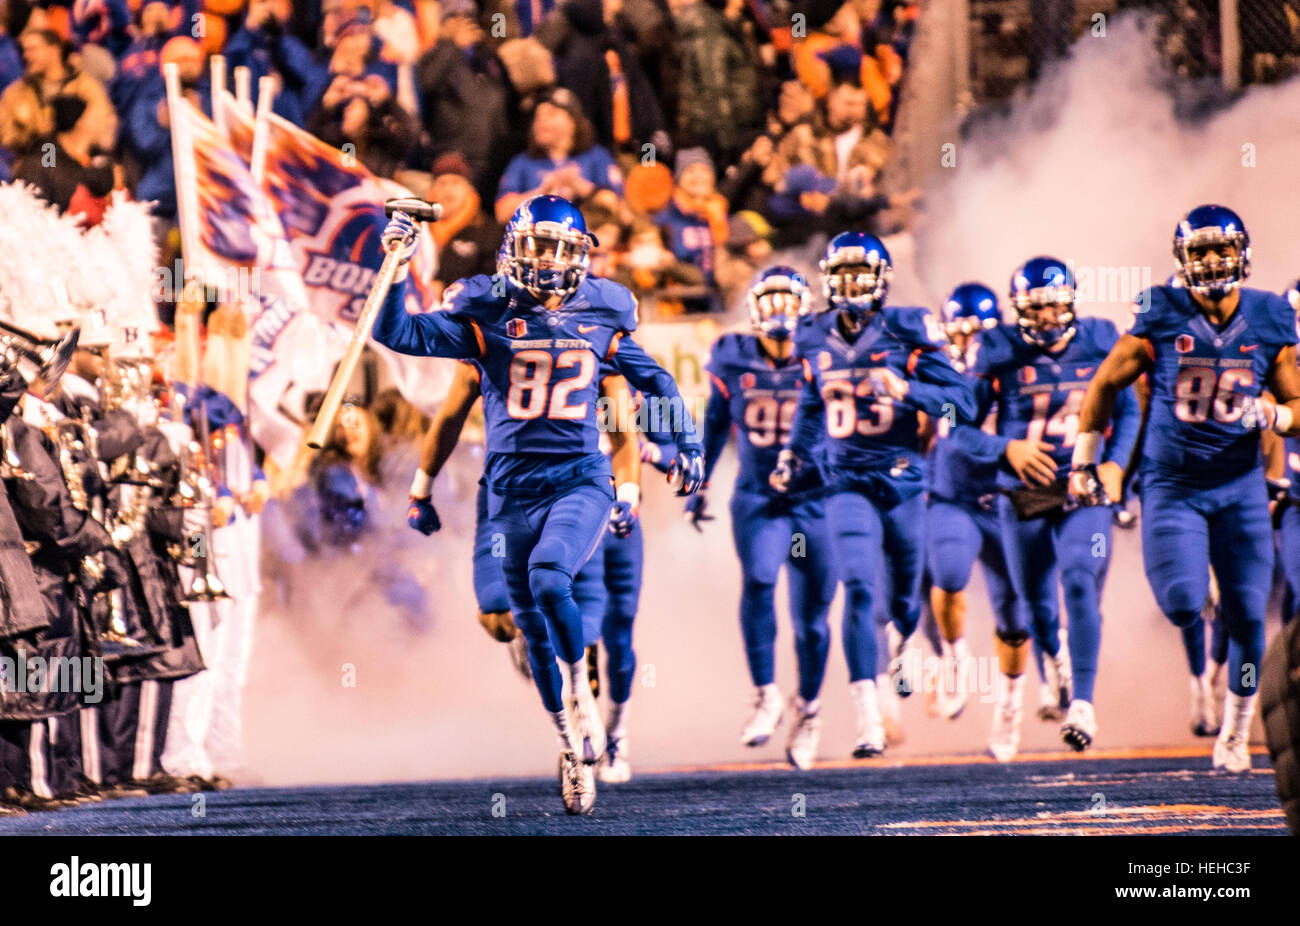 Boise State Football Game, Albertson Stadium, 2016, Boise, Idaho, USA - Stock Image